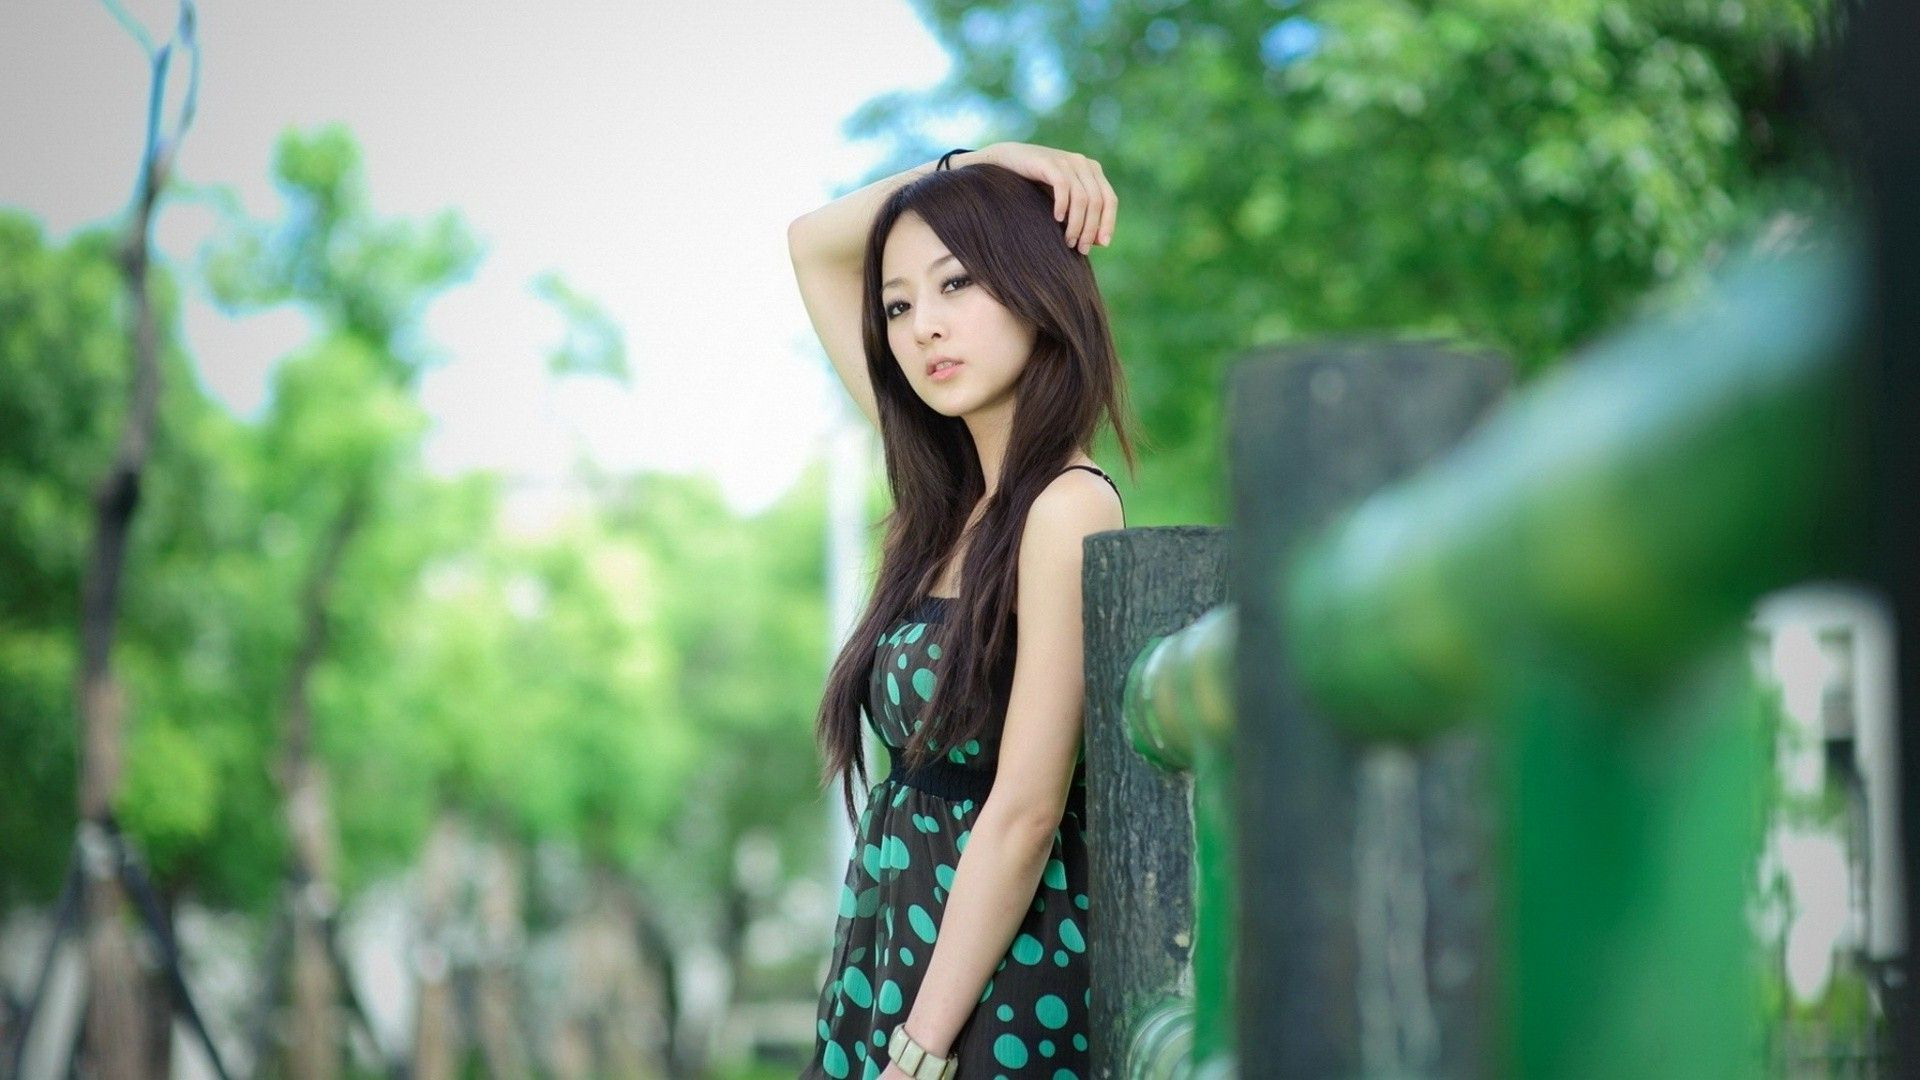 Mikako Zhang Kaijie HD Wallpaper Background Image 1920x1080